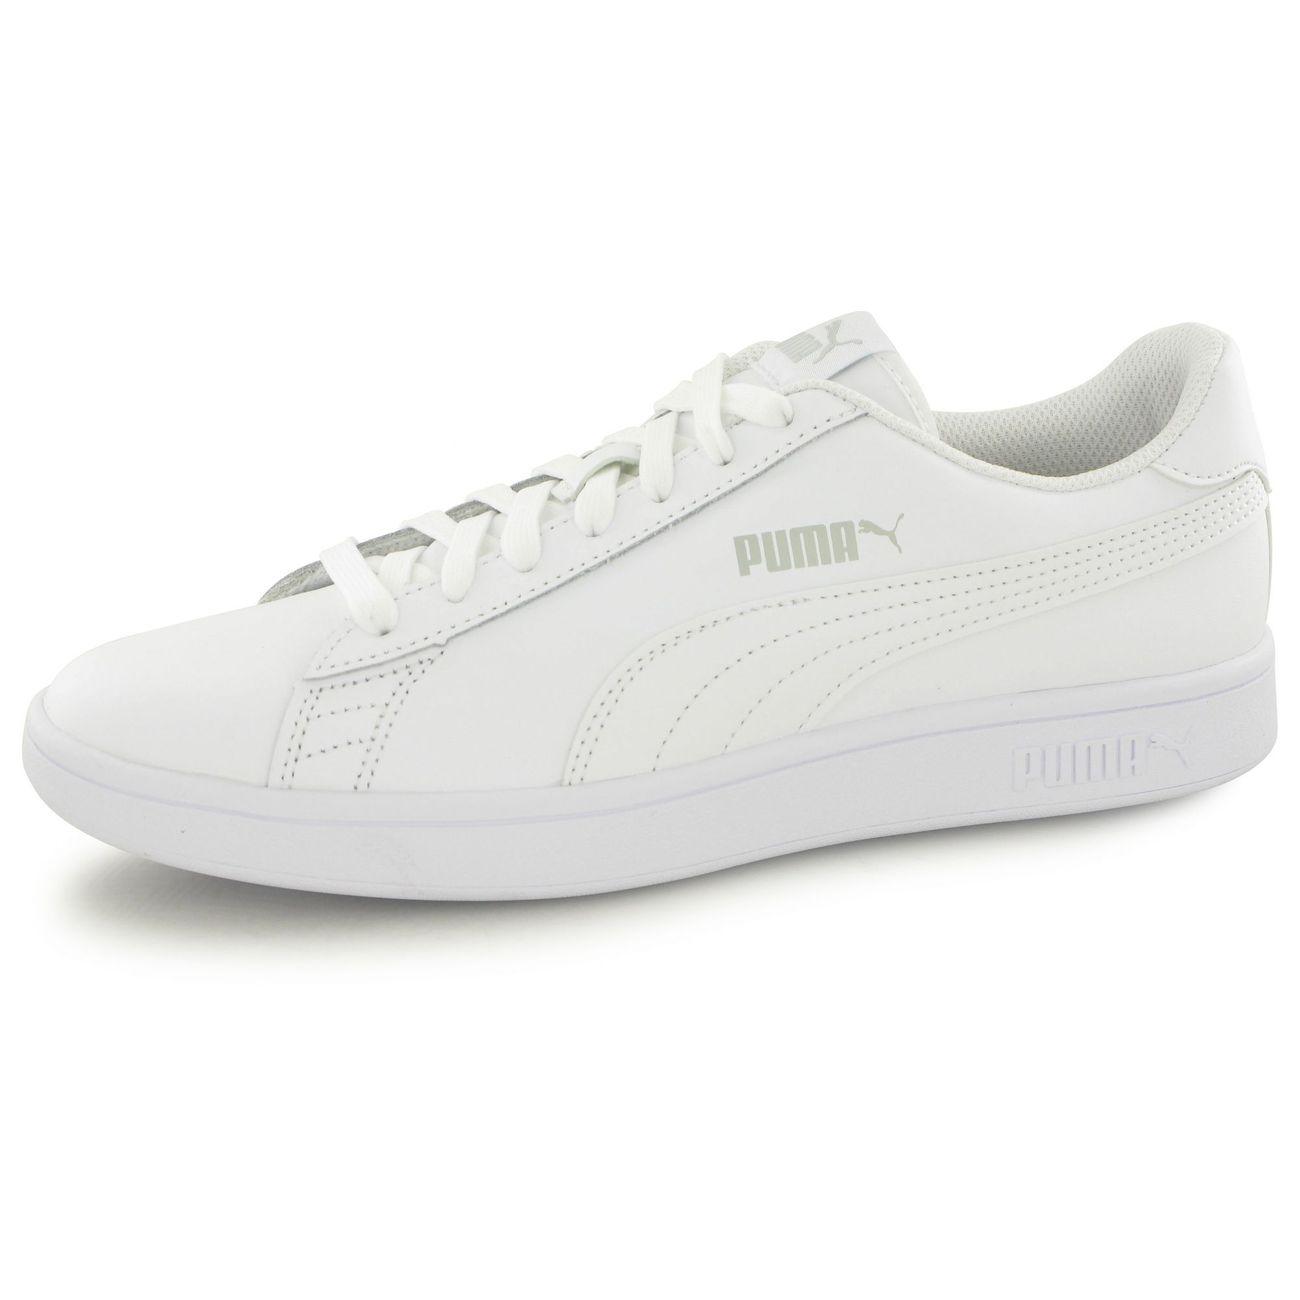 Mode- Lifestyle homme PUMA Puma Smash V2 L blanc, baskets mode homme